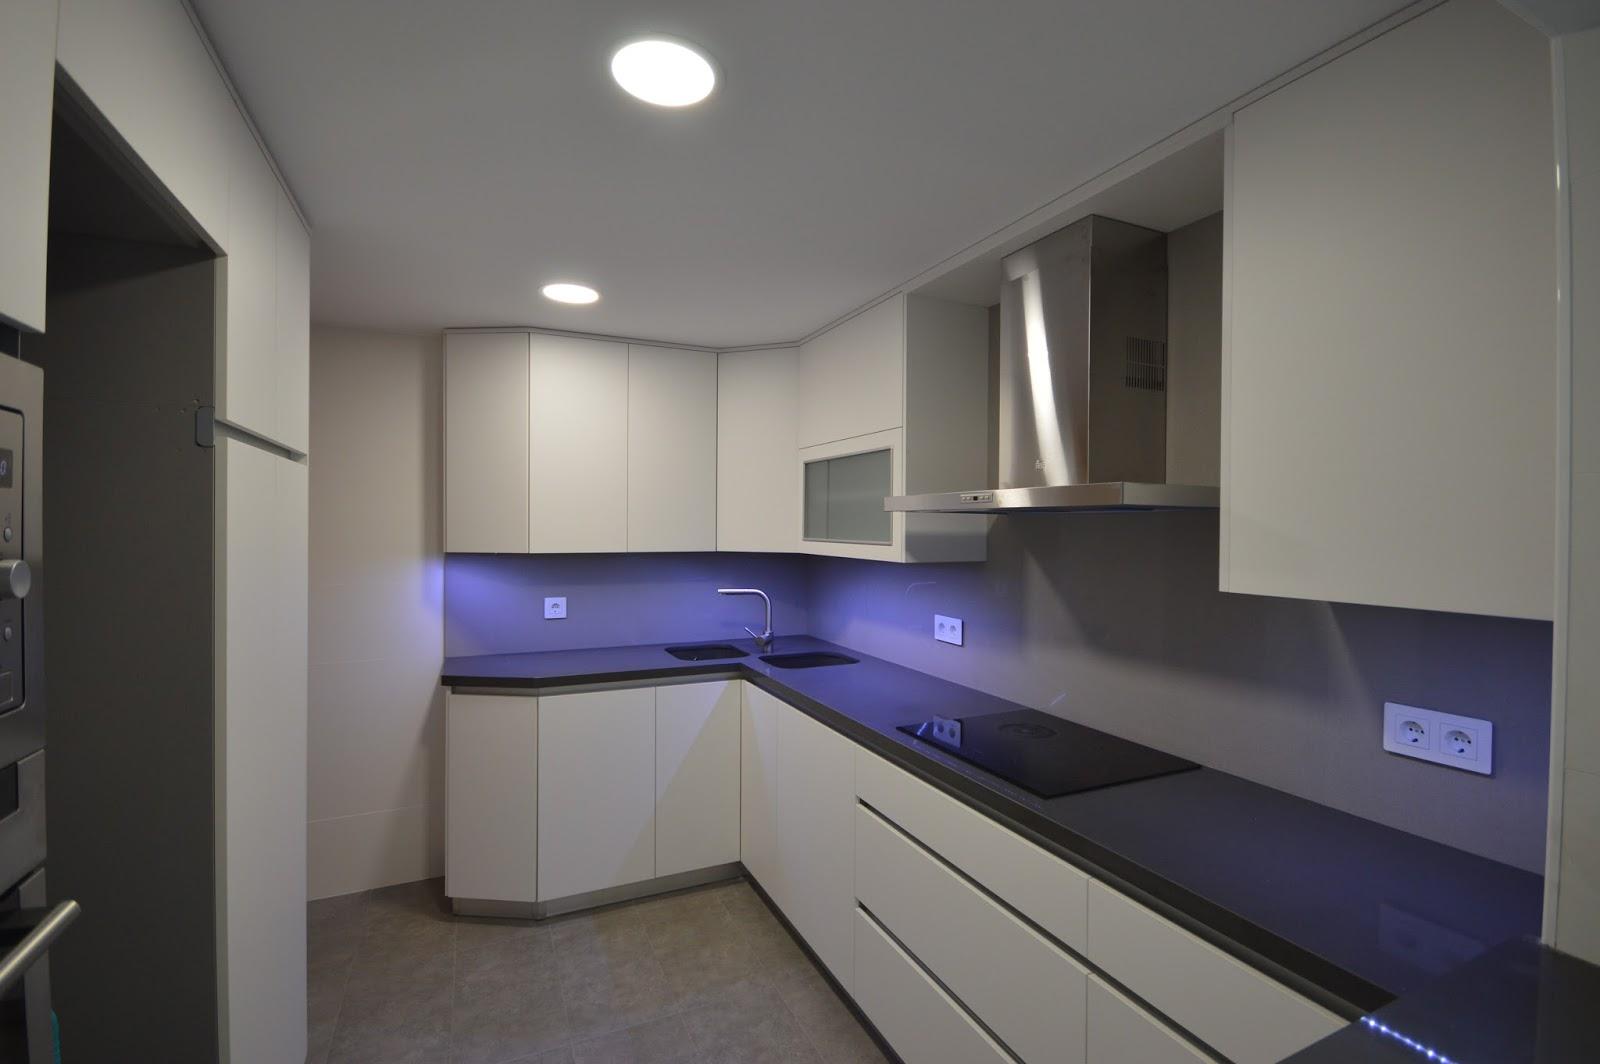 Reuscuina muebles de cocina en blanco mate sin tiradores - Tiradores muebles de cocina ...